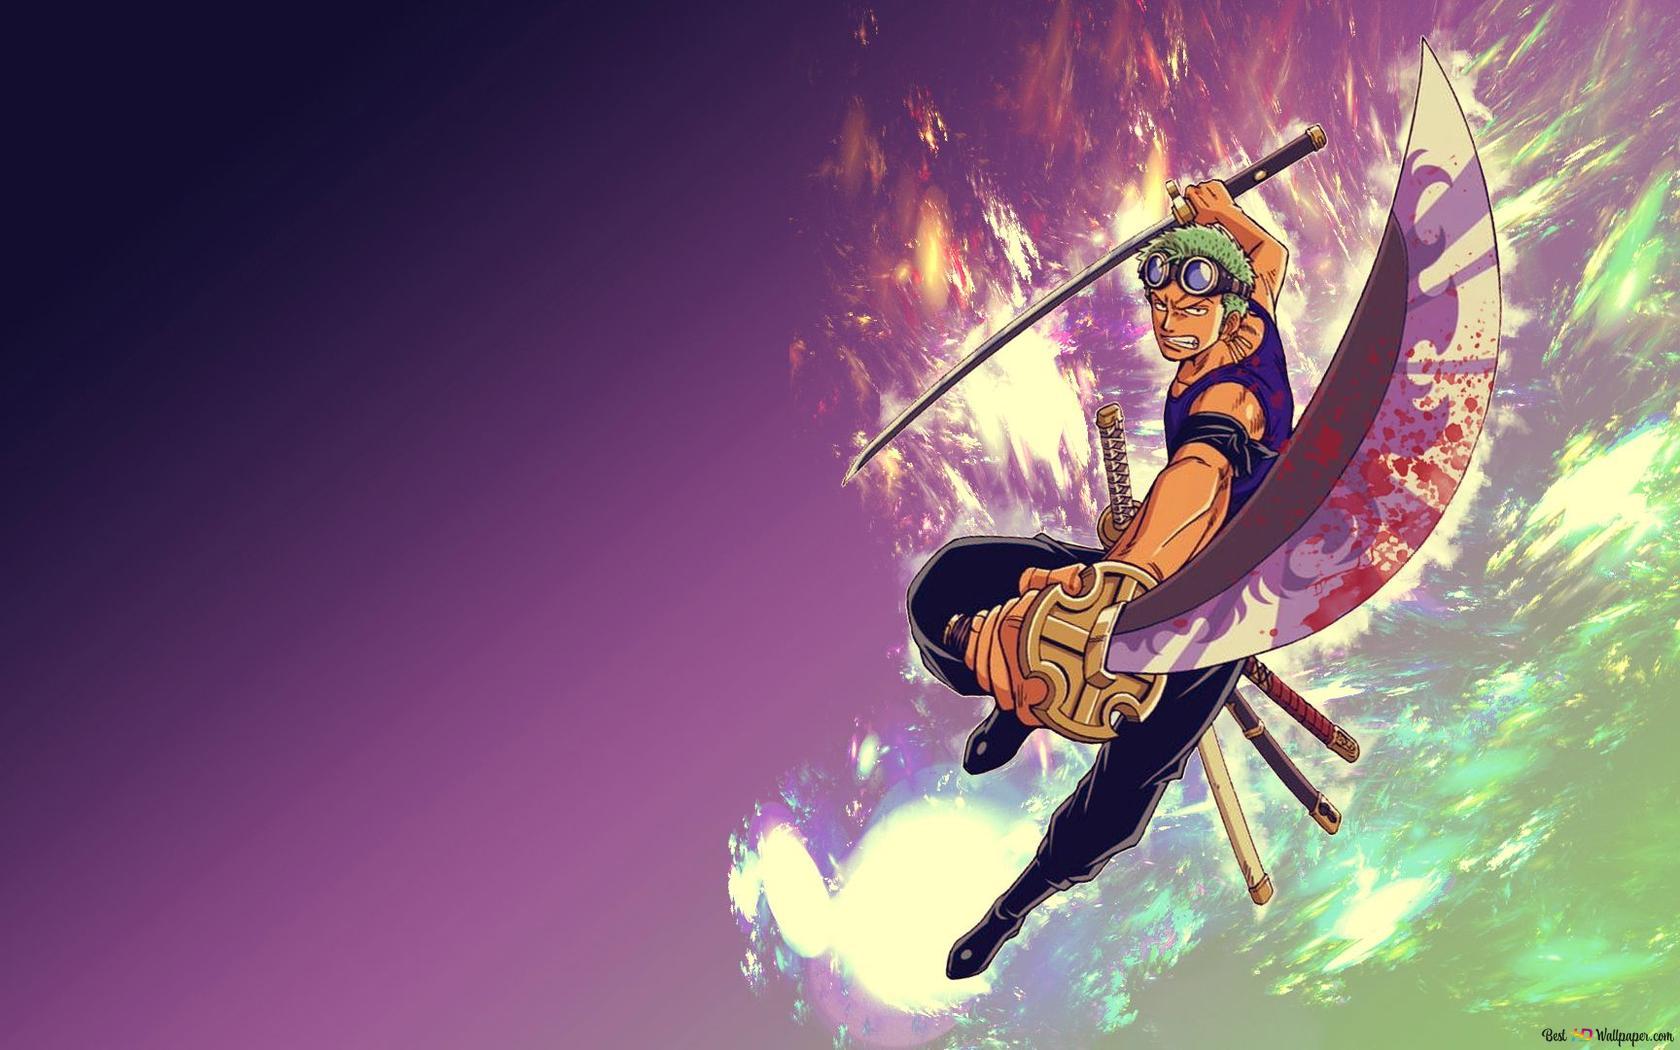 Zoro Samurai One Piece Wallpaper Wallpapers Heroes